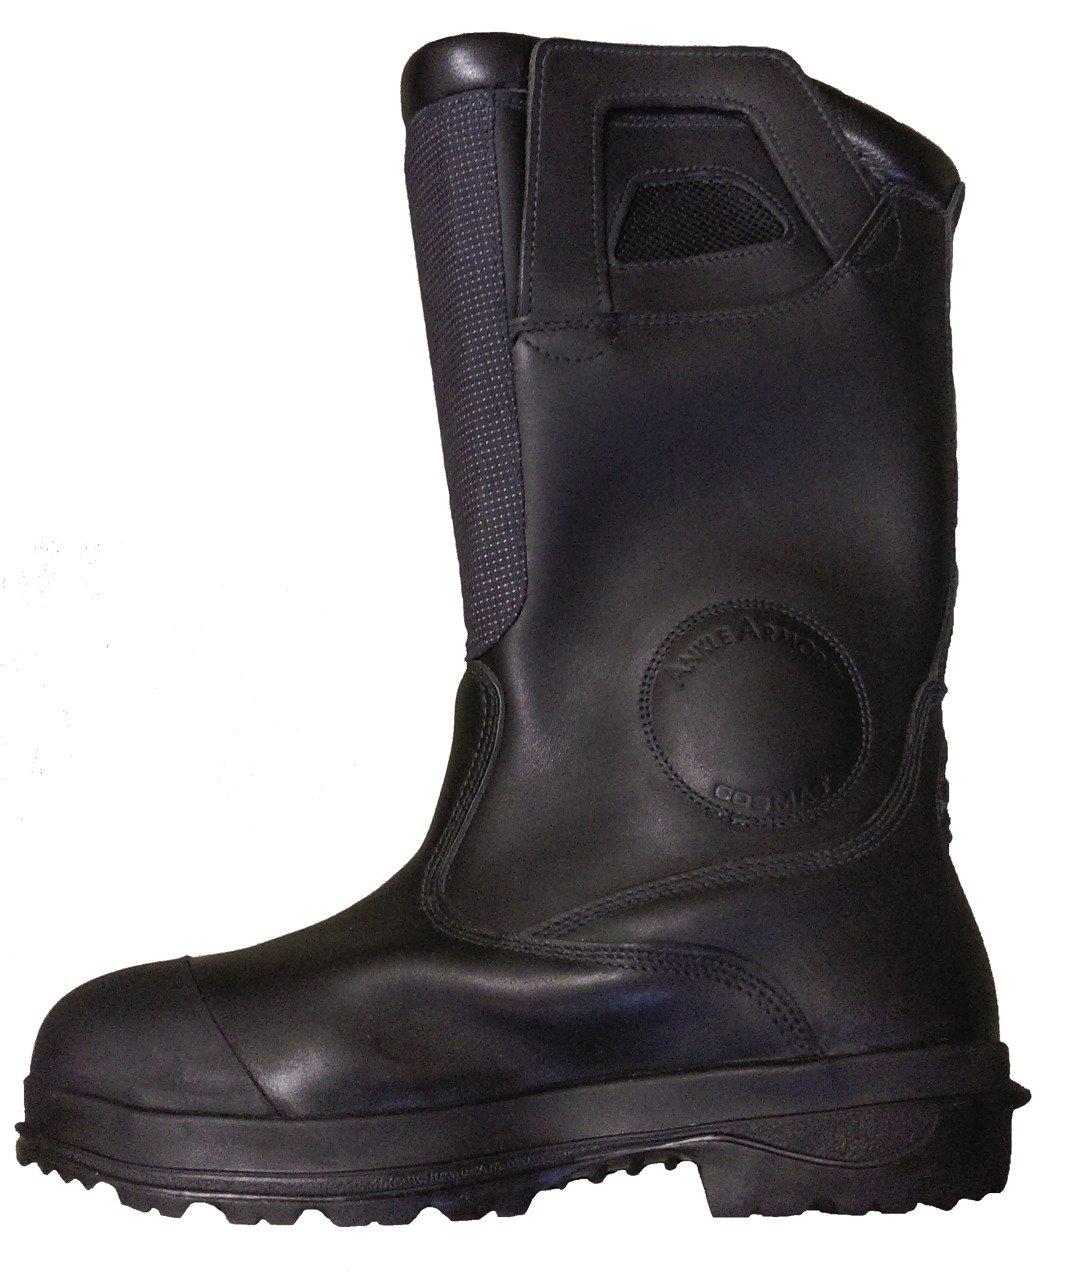 Fire \\ Footgear \\ Boots militarysurplus.ro